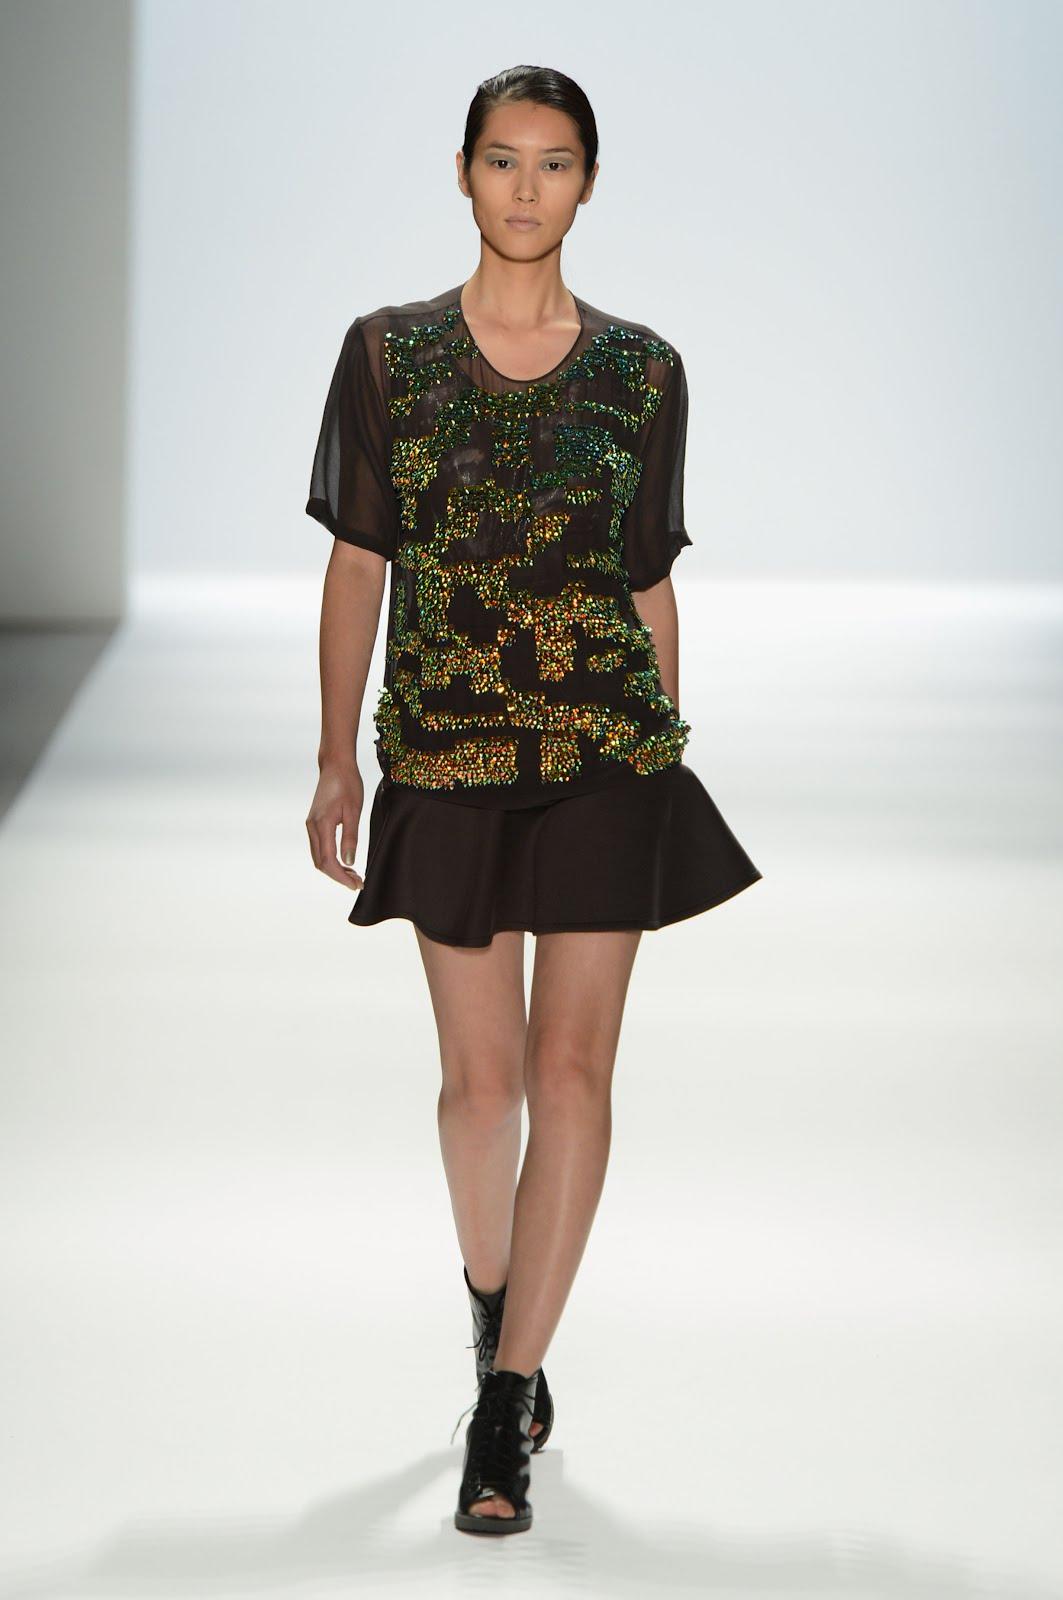 Erin Barr Fashion Designer Age